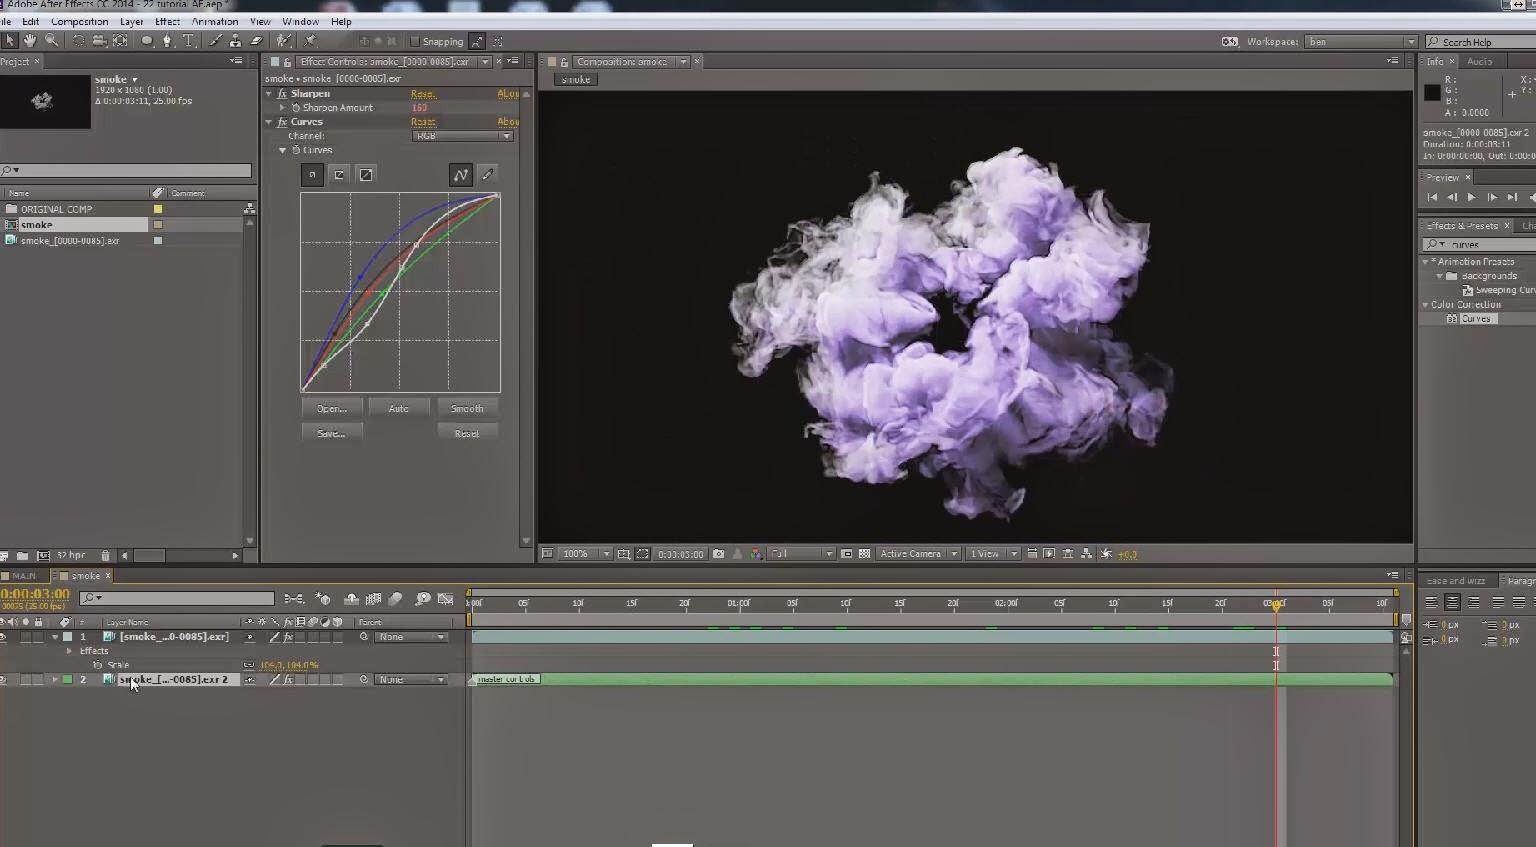 Creating Crystal Ball Ident in Cinema 4D | CG TUTORIAL